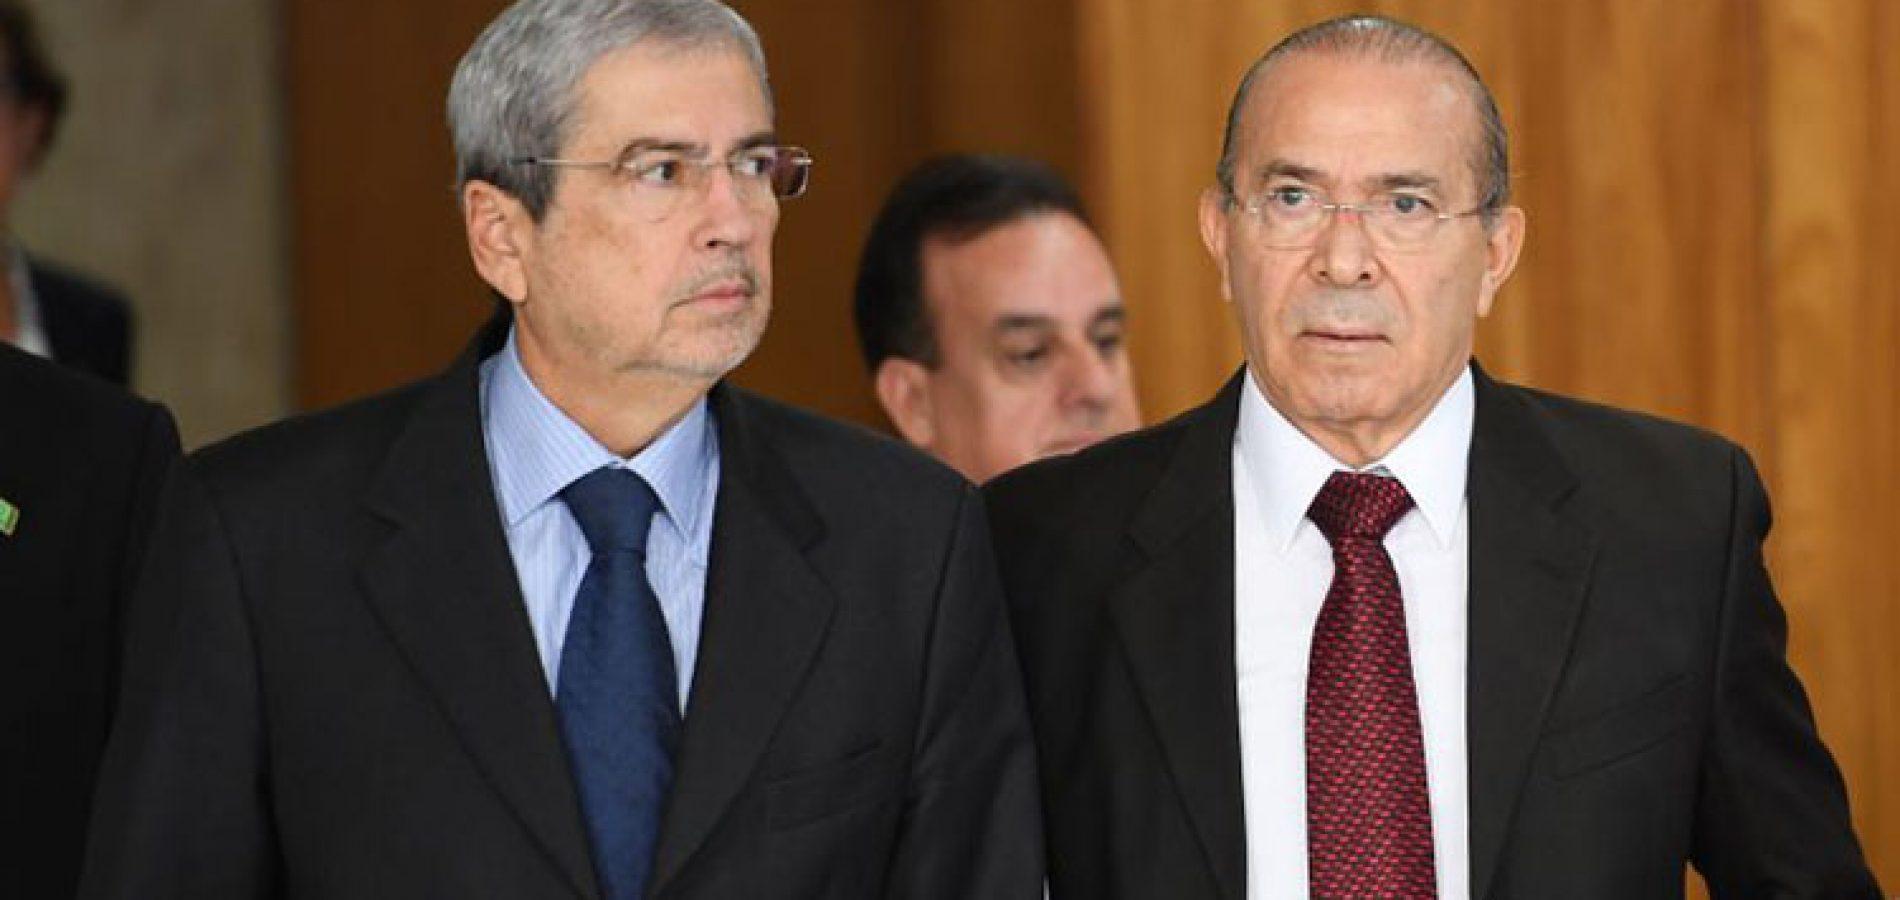 Planalto mira cargos de deputados que votaram contra a reforma trabalhista